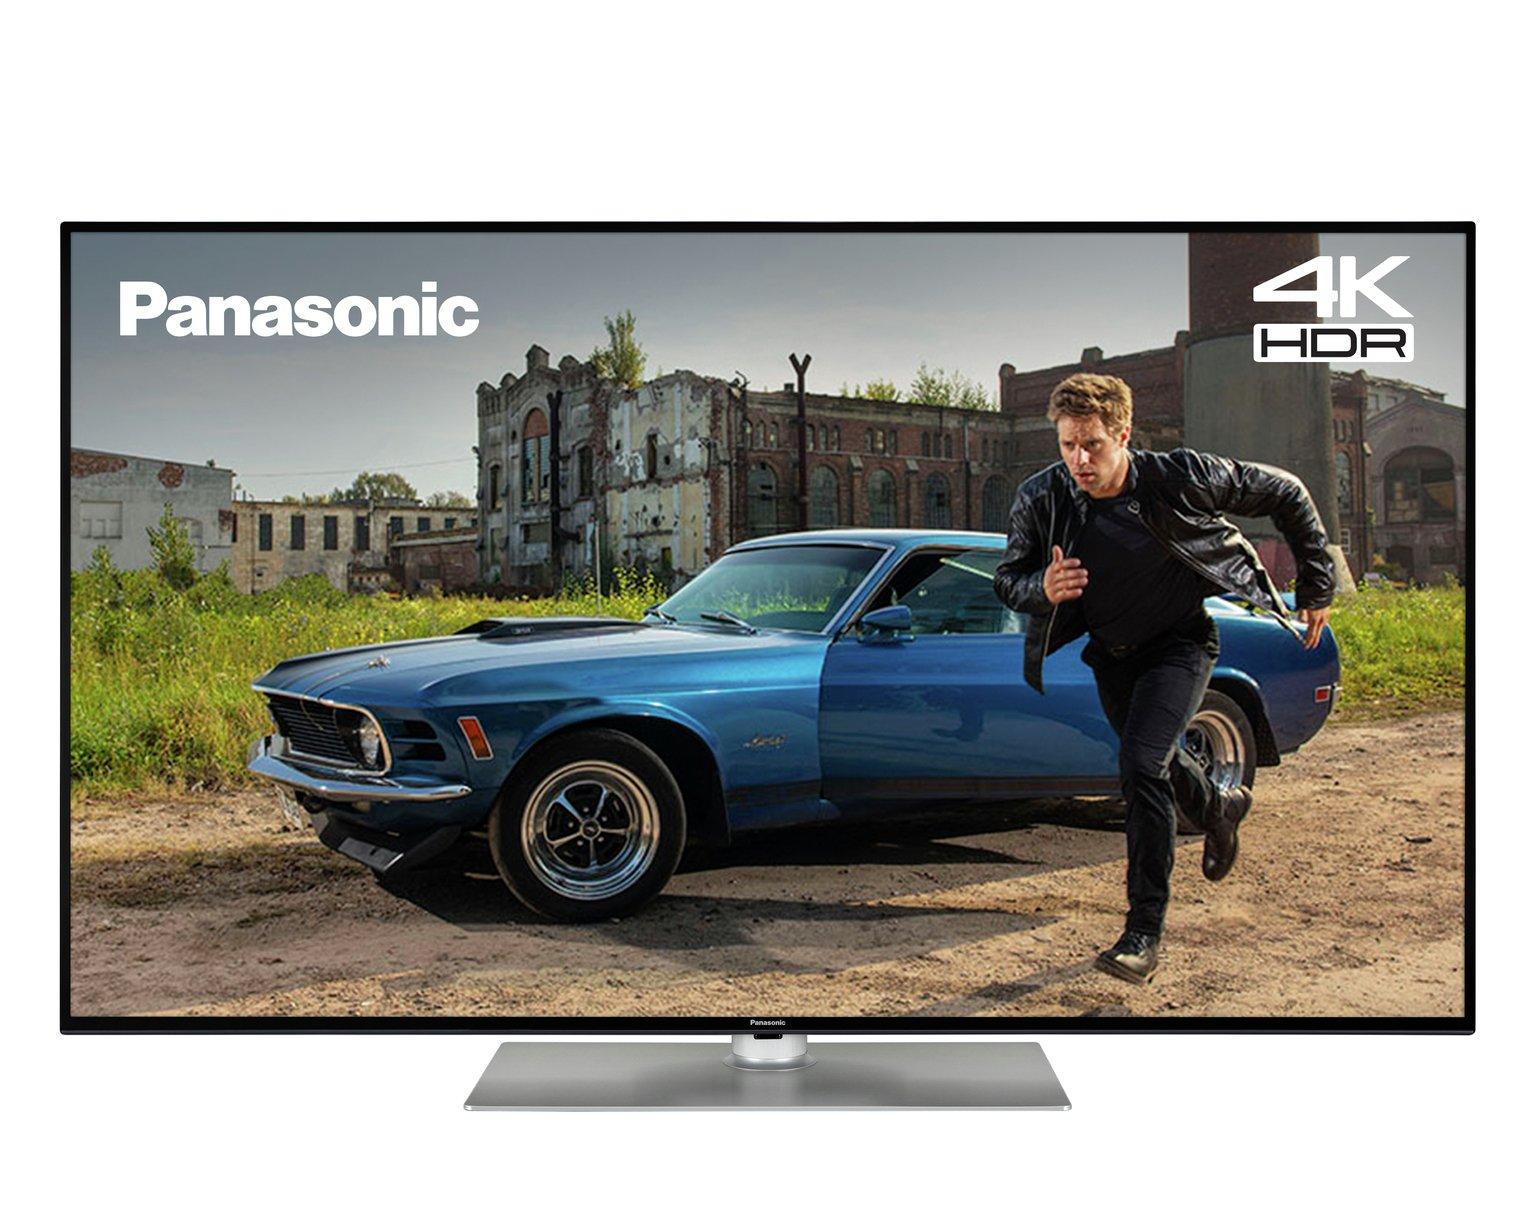 Panasonic 65 Inch TX-65GX560B Smart 4K TV with HDR